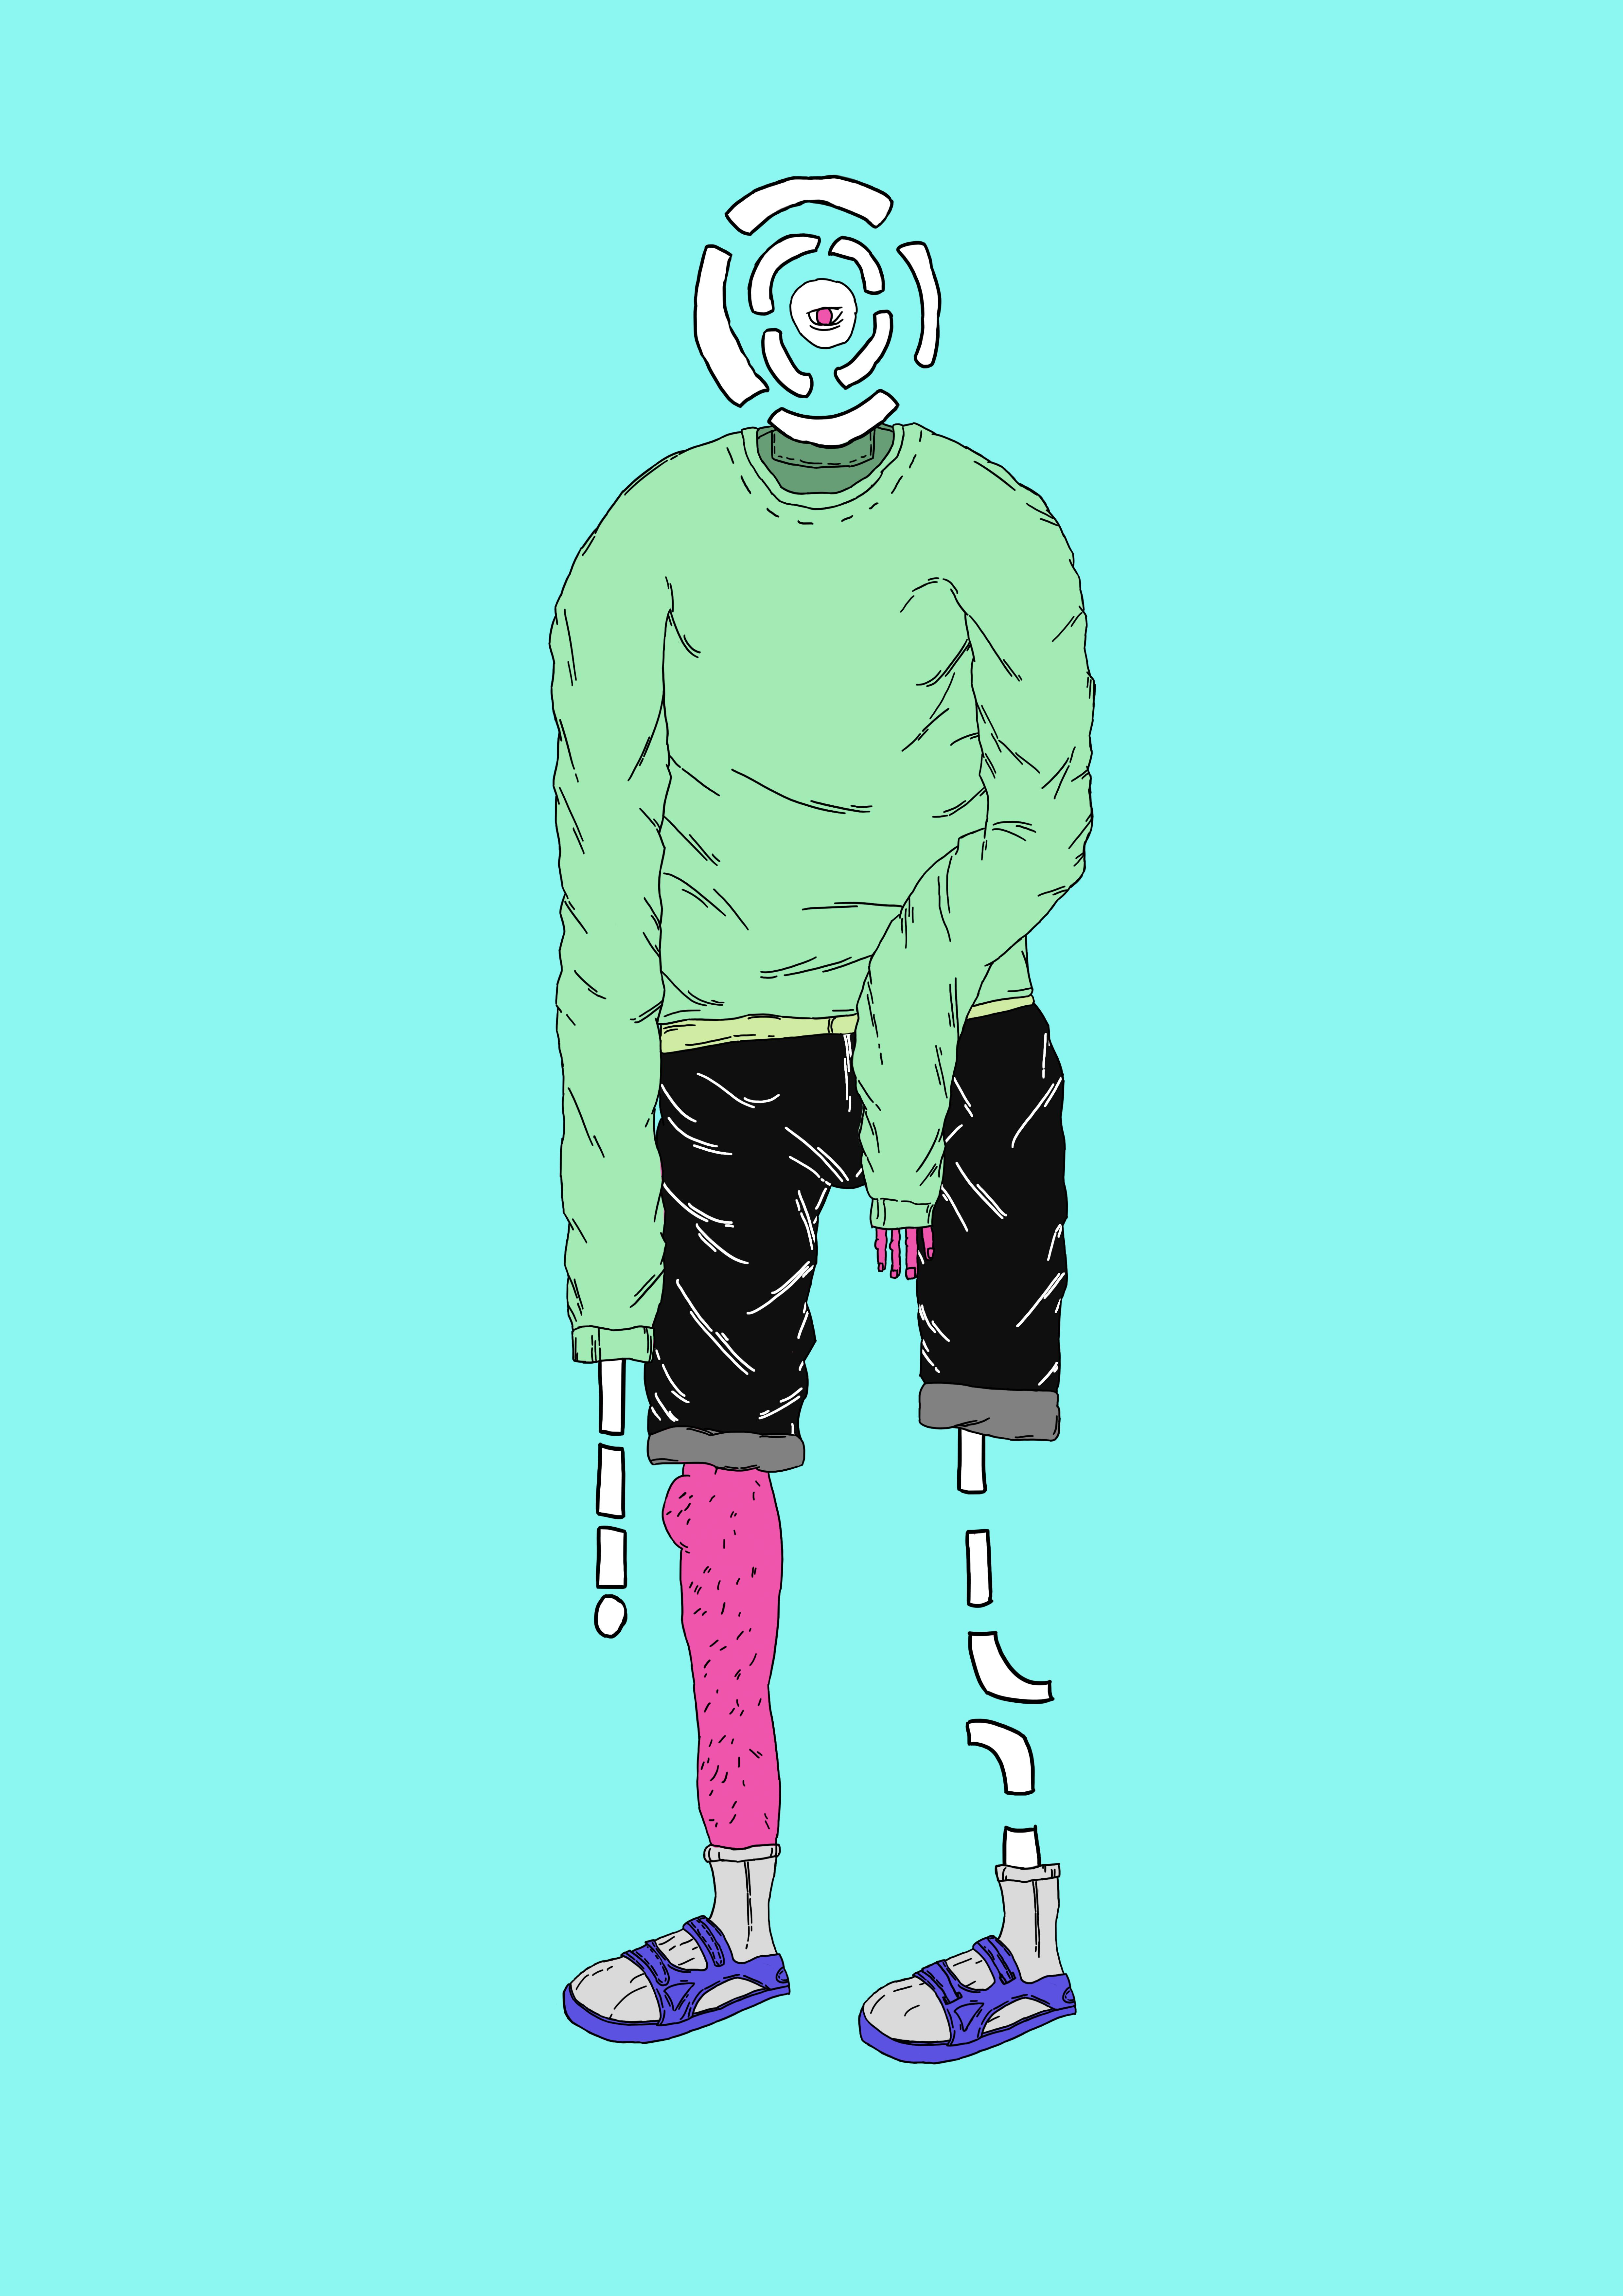 Stylized man